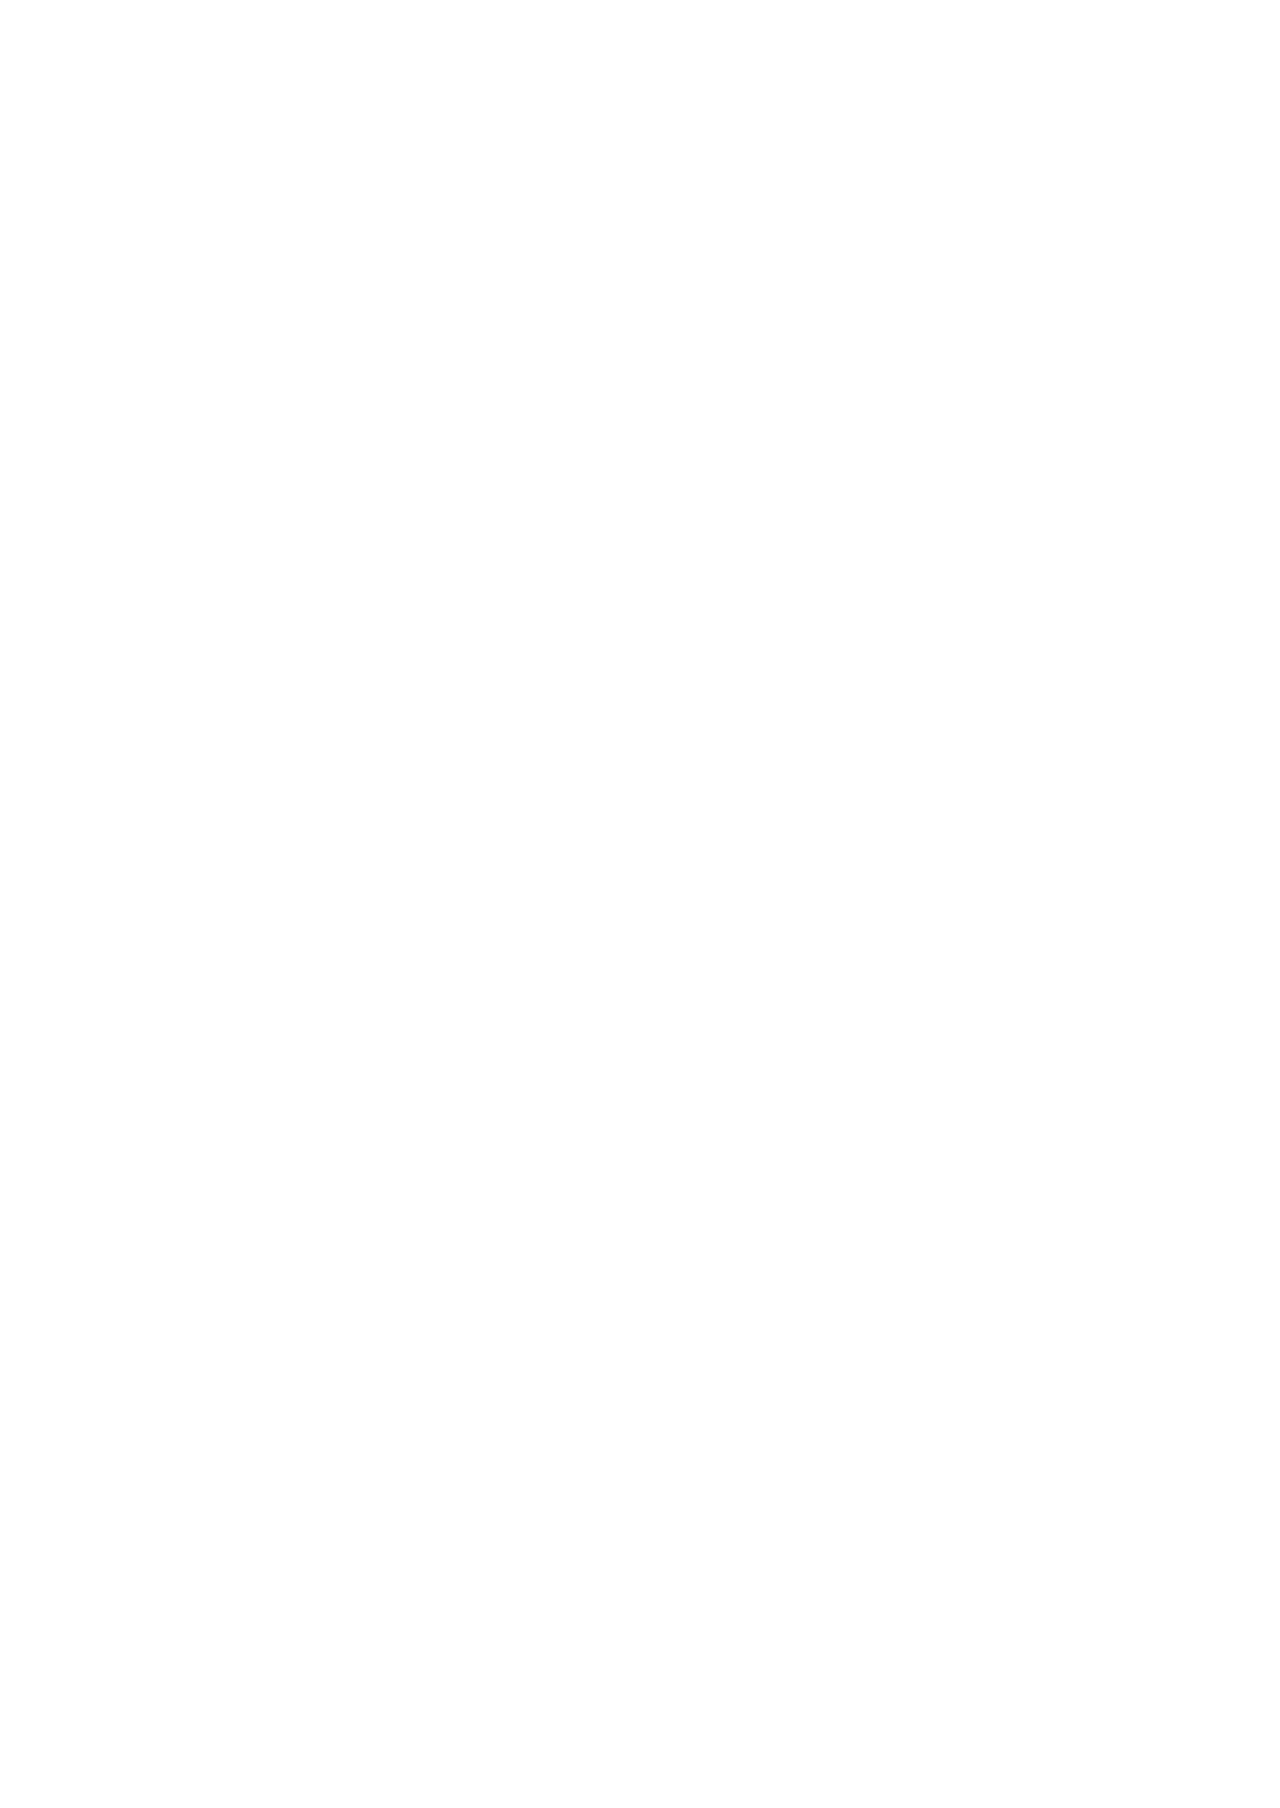 [Tomato Kanzume (Tomatomato)] Cat-chan Kozukuri Daisakusen | Cat-chan's Childmaking Grand Strategy (Fate/Grand Order) [English] [Kemonomimi Saikou] [Digital] 1